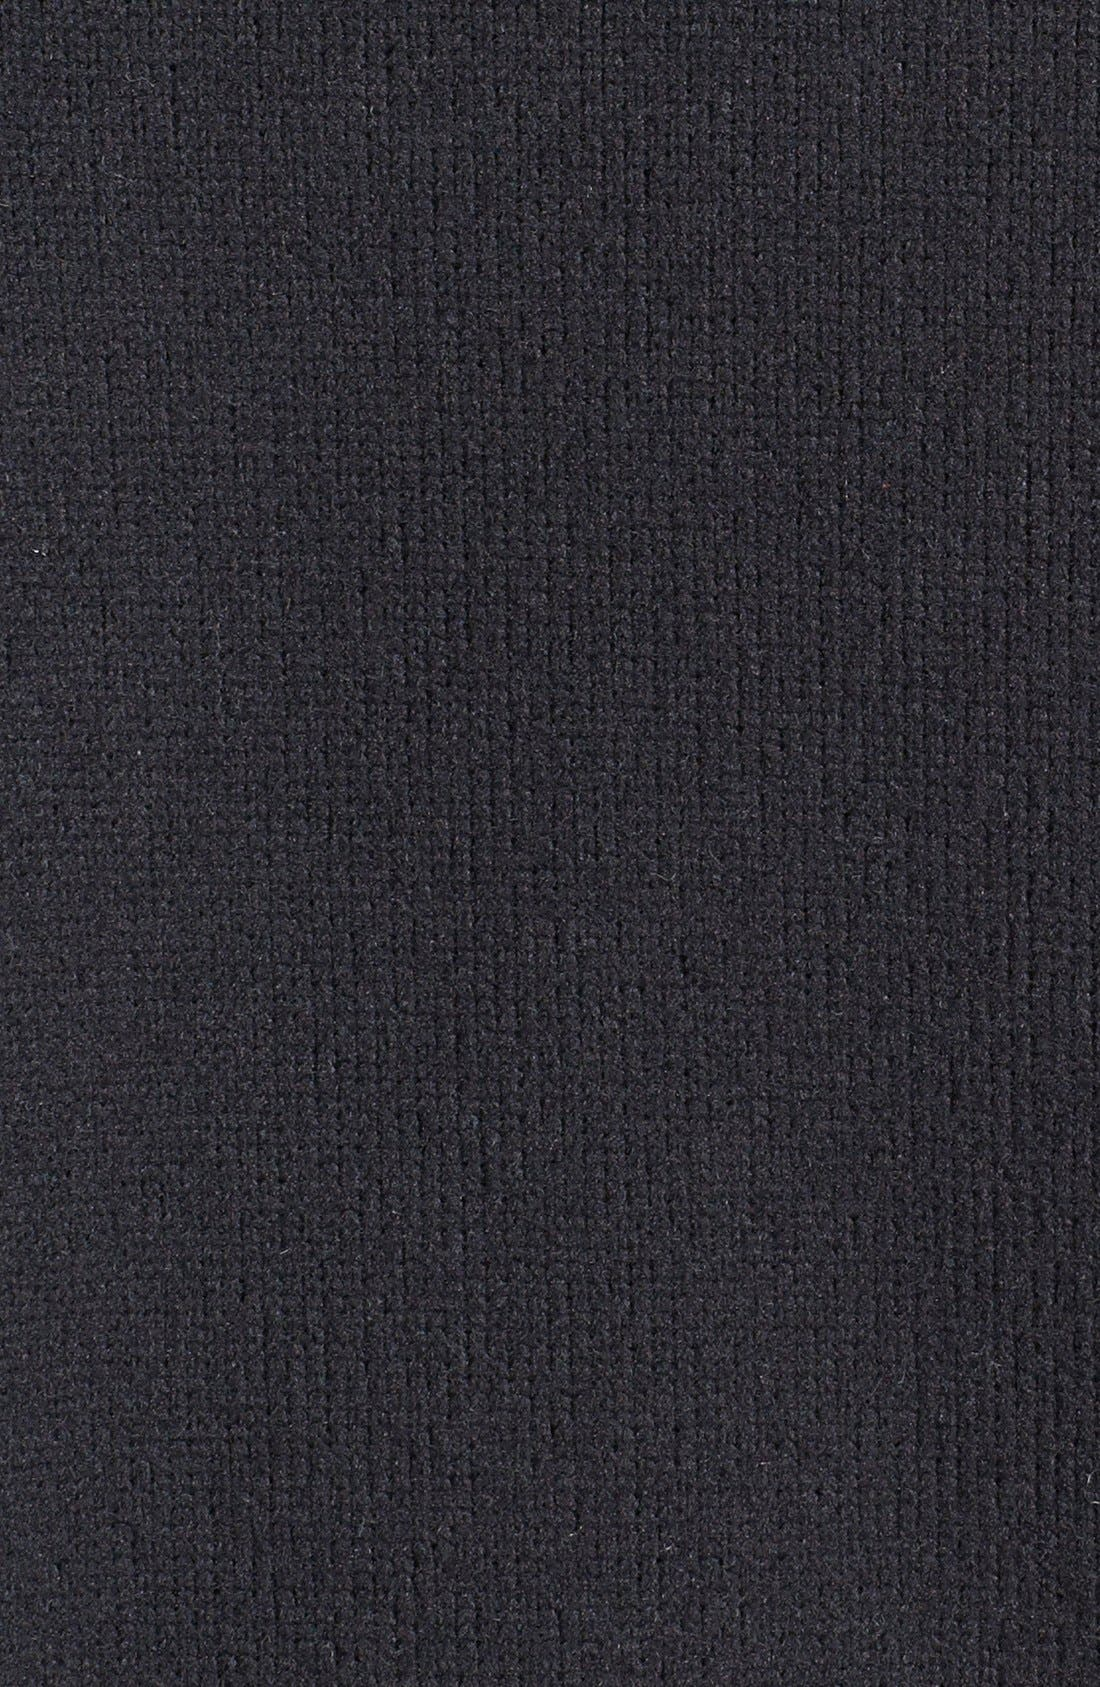 Alternate Image 3  - The North Face 'Gordon Lyons' Sweater Knit Fleece Jacket